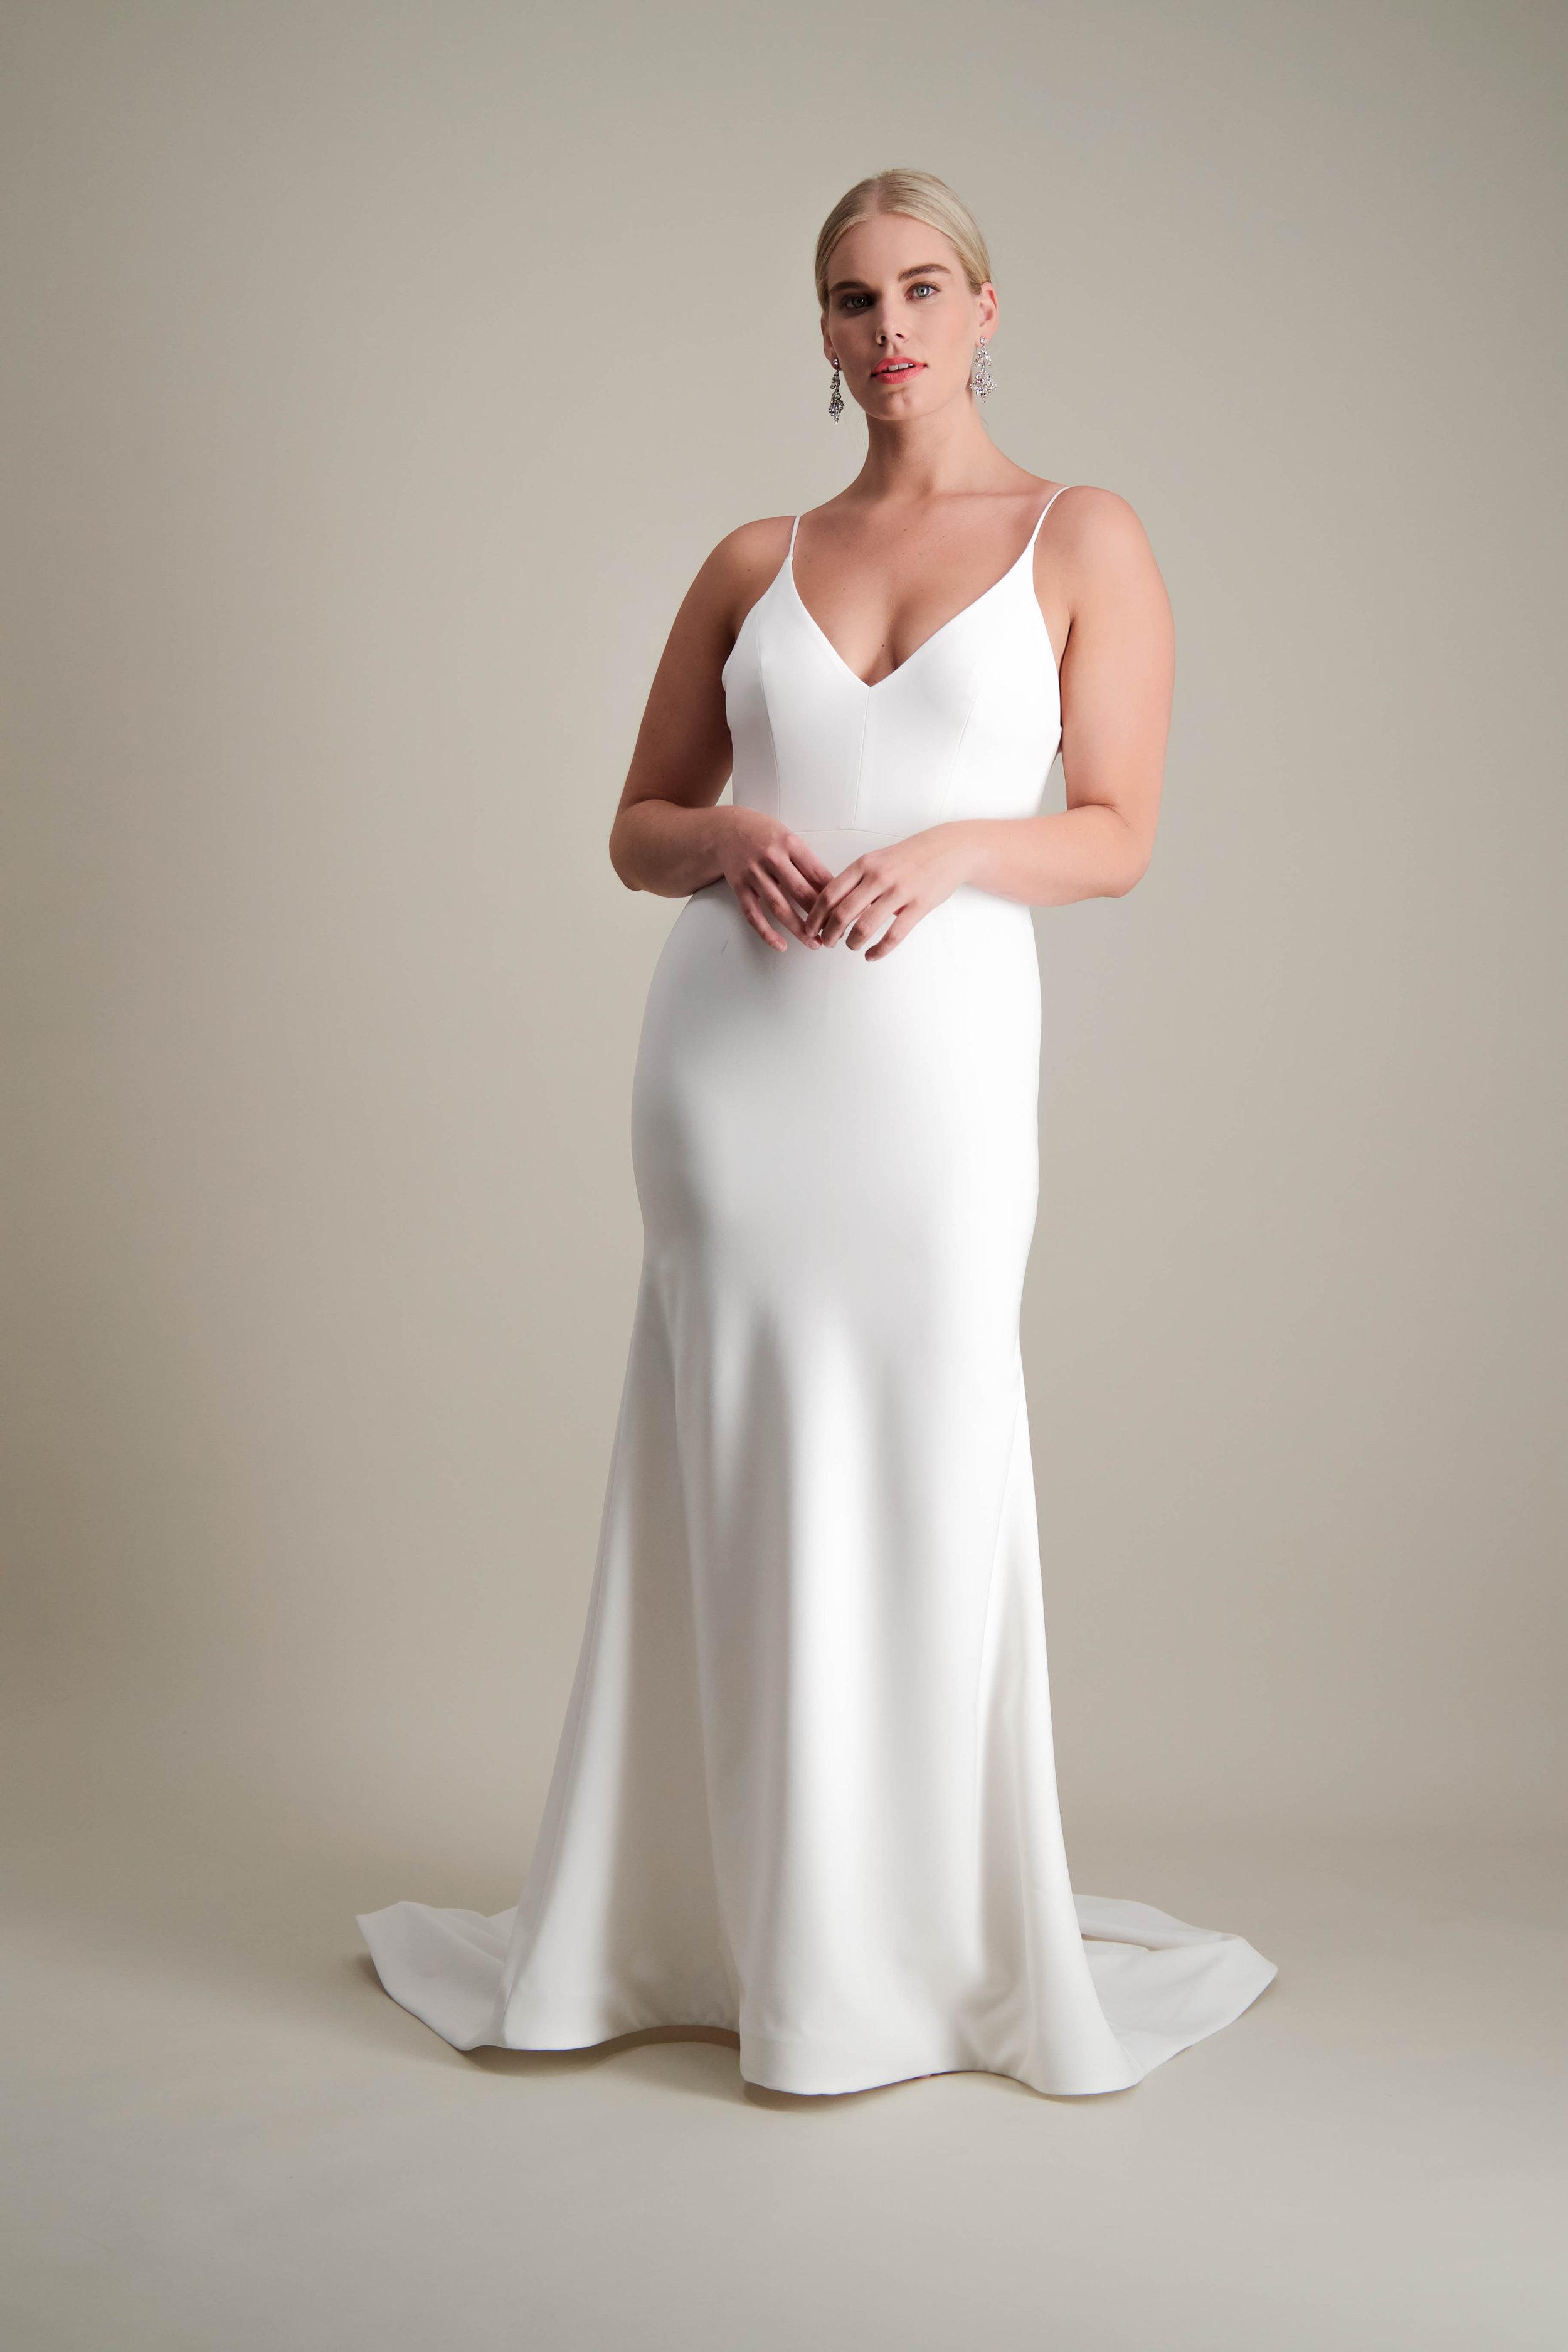 Islet gown fitted modern sleek wedding dress 1.jpg